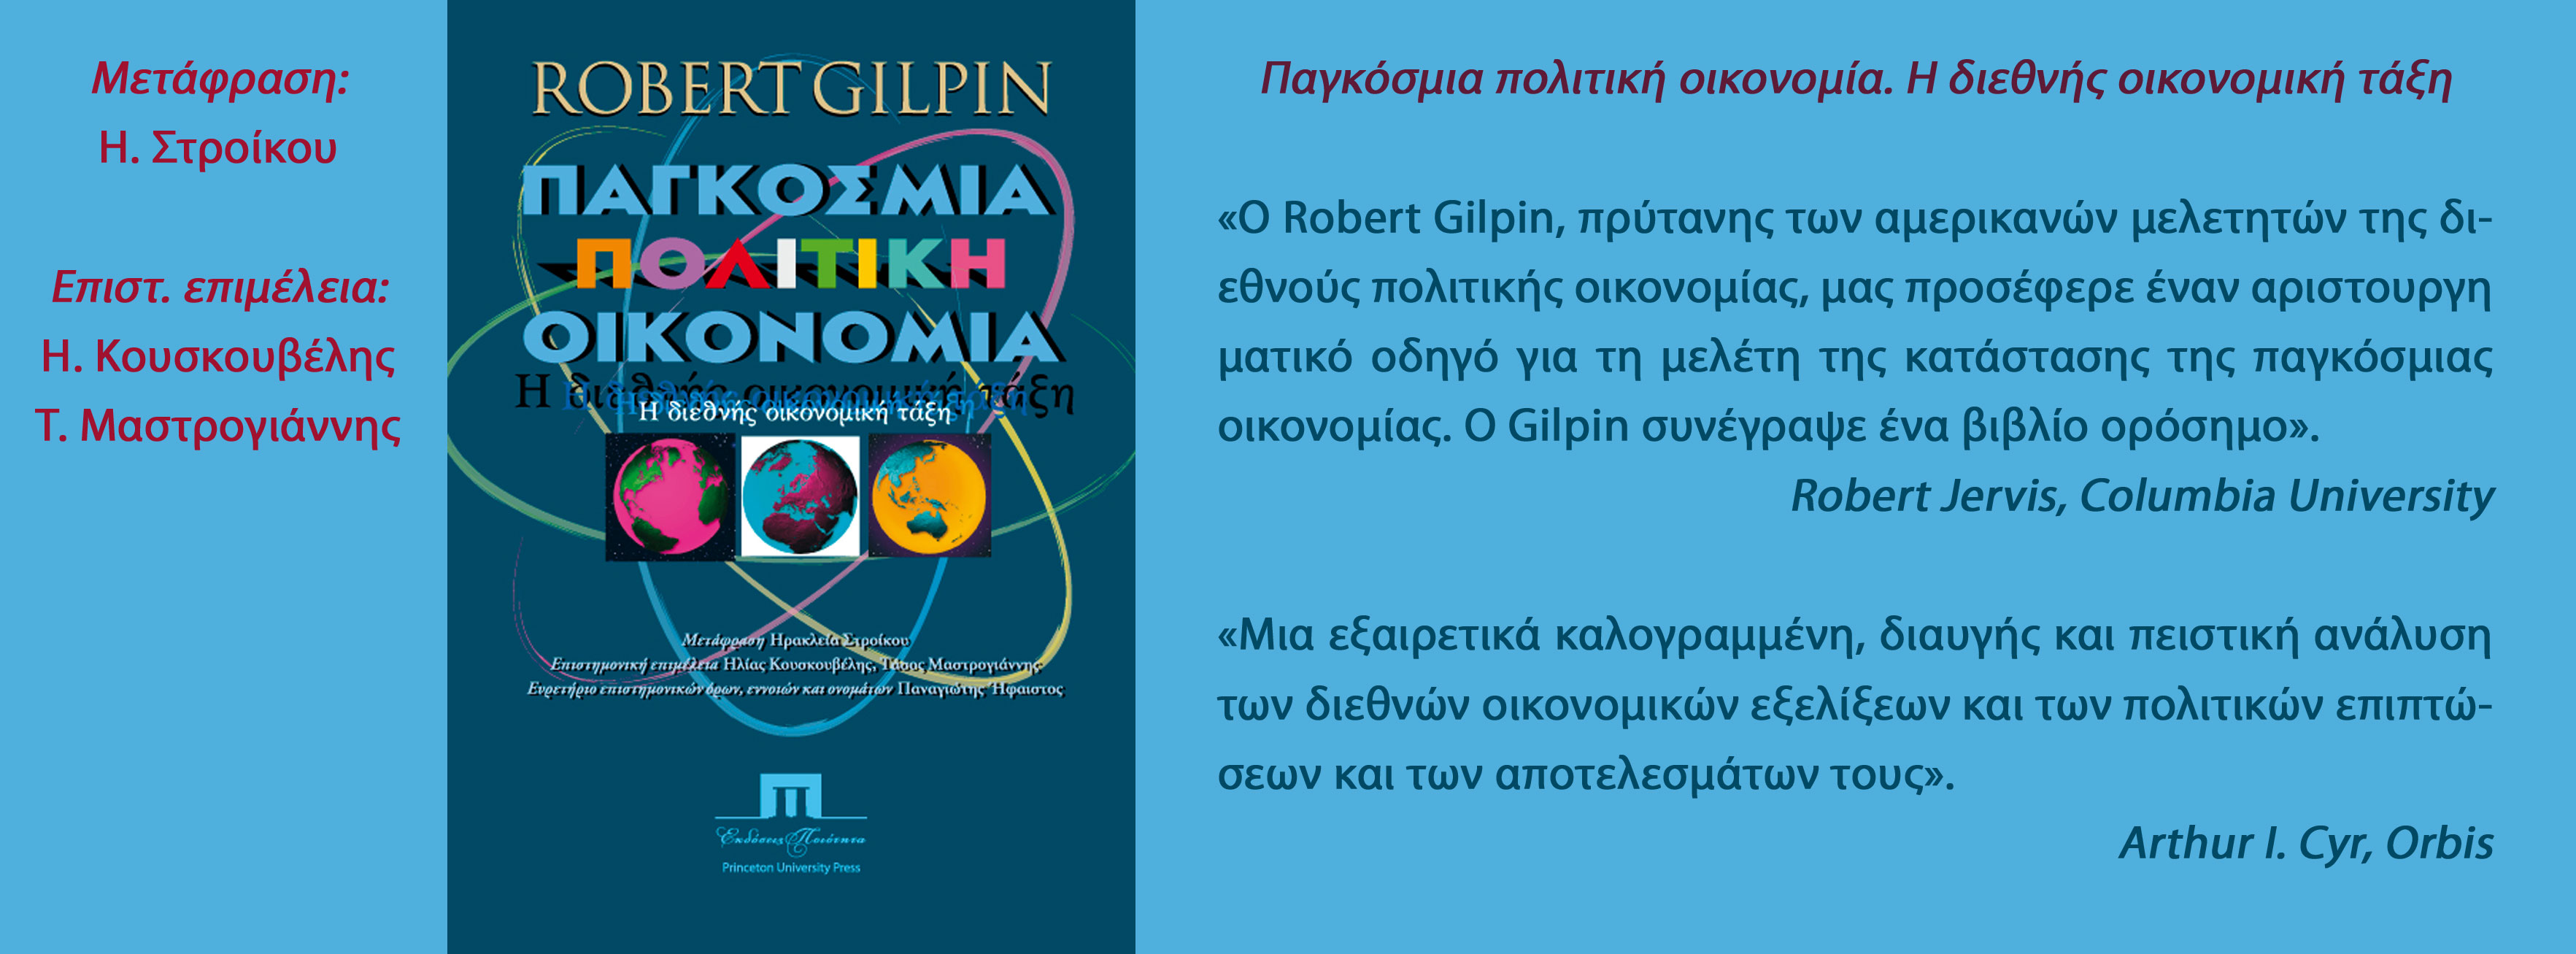 Robert Gilpin, Παγκόσμια πολιτική οικονομία